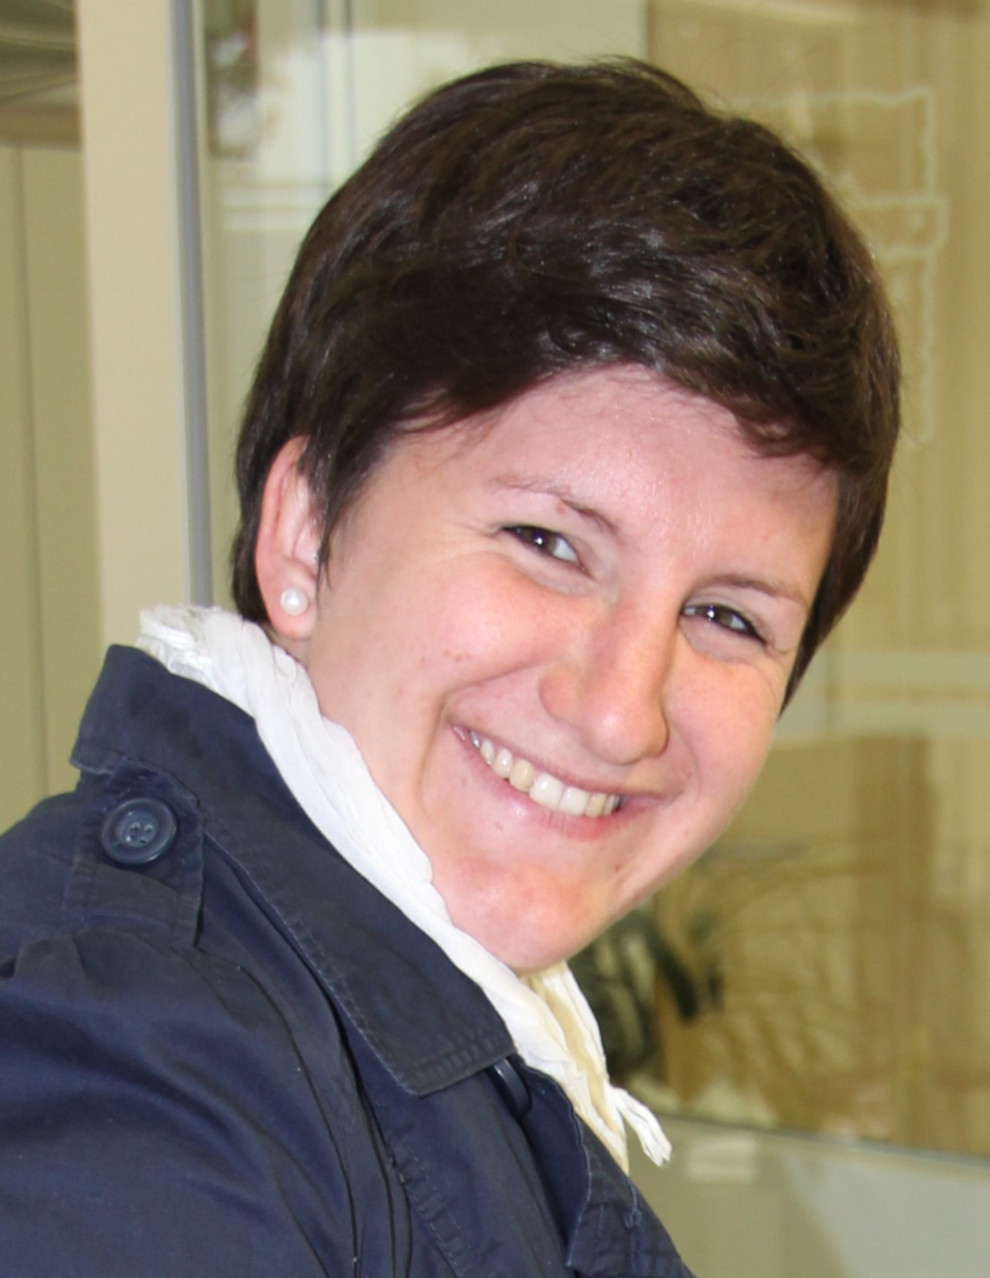 Telch Alexandra